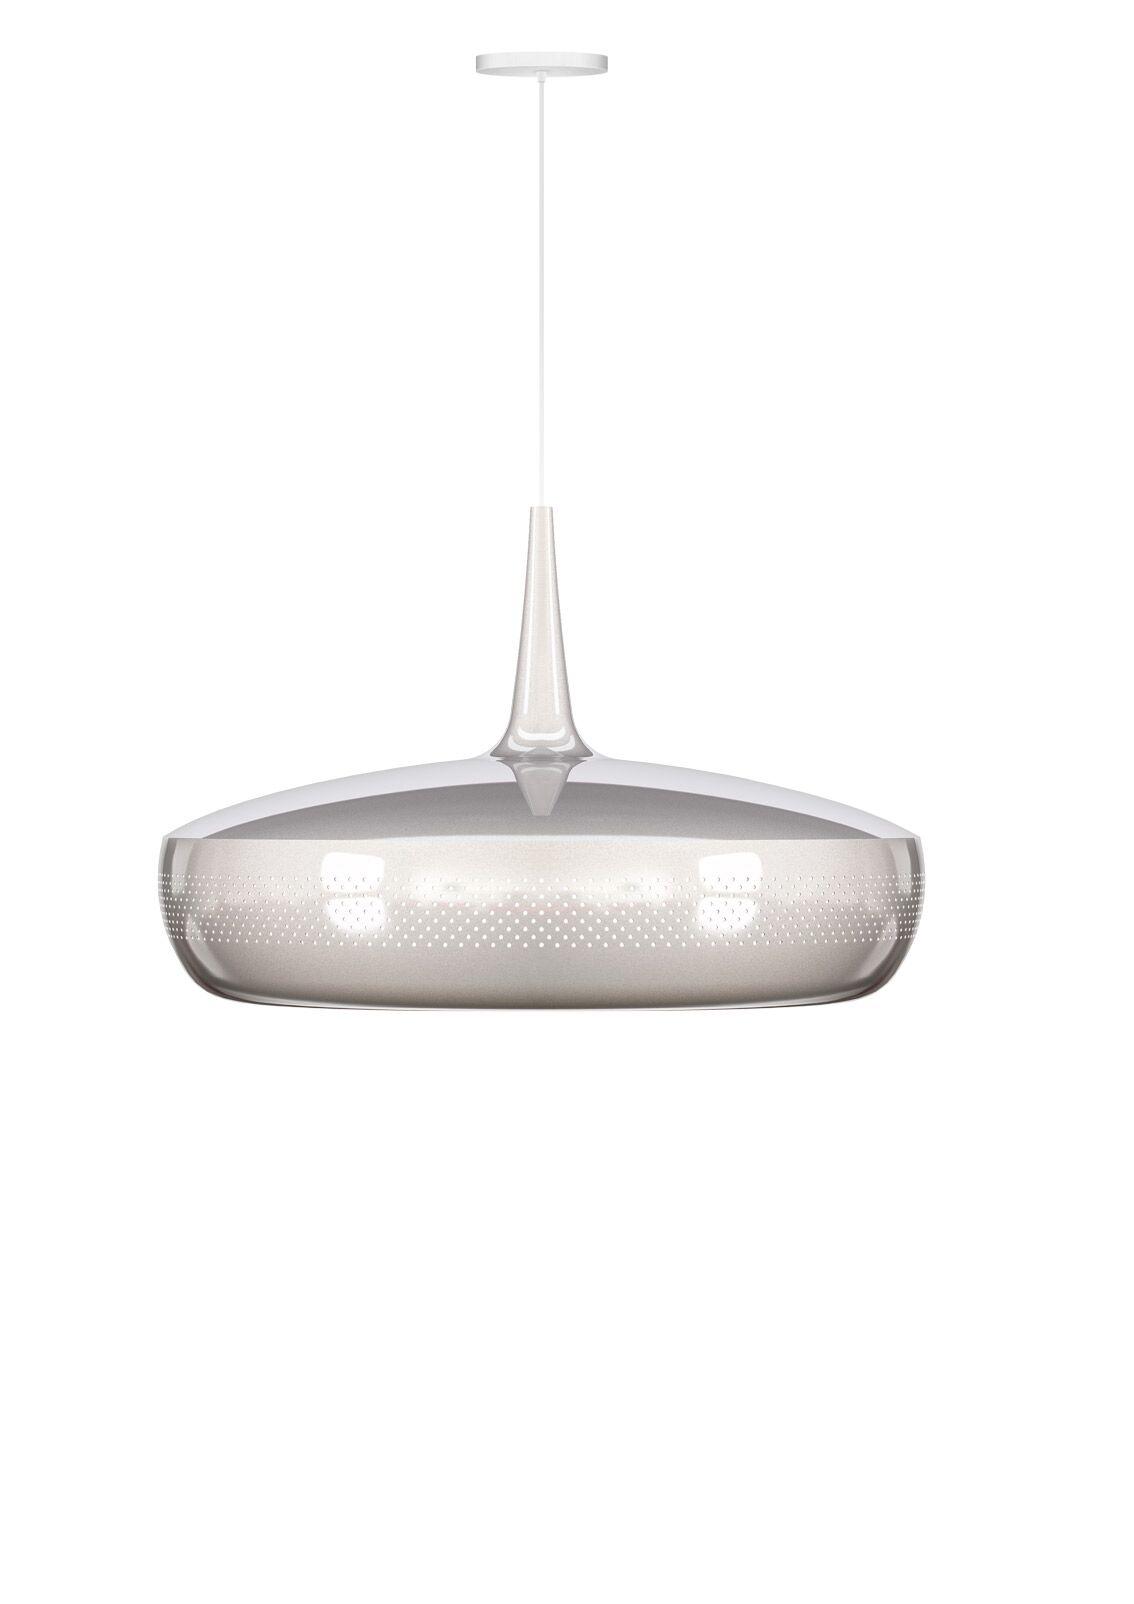 1-Light Hardwired Pendant Finish: Polished Steel, Cord/Cable Finish: White